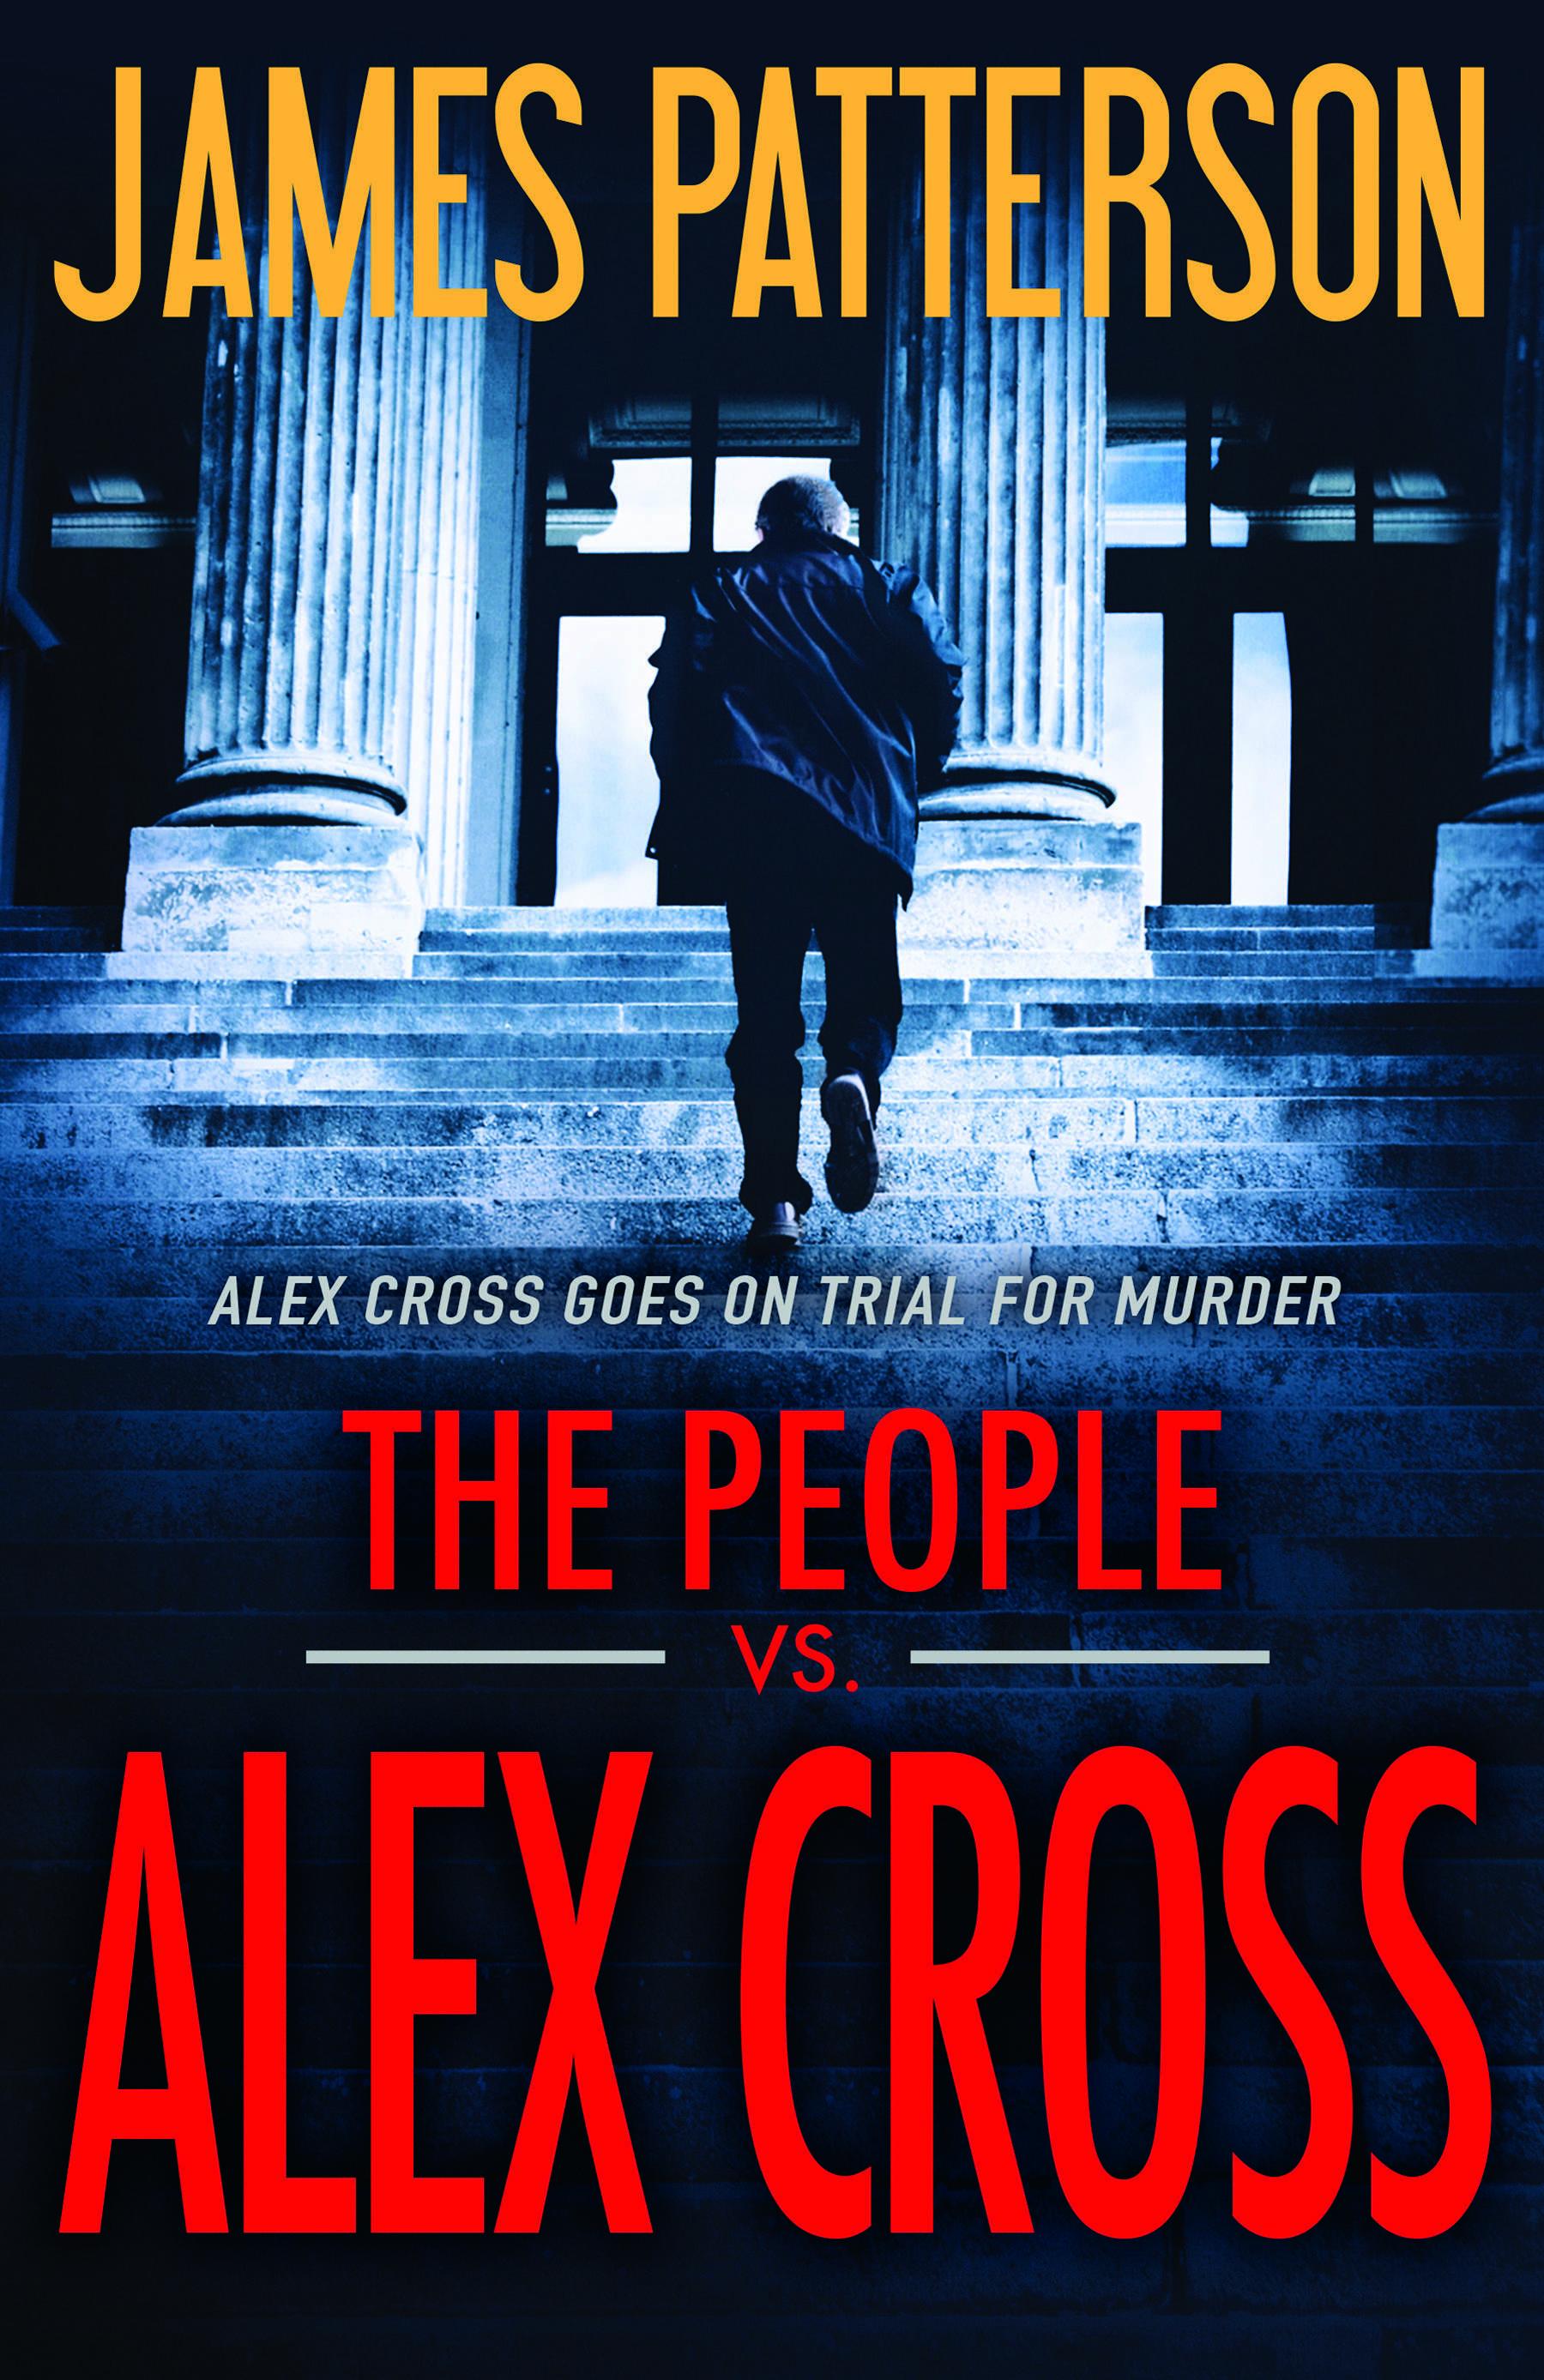 The People vs Alex Cross